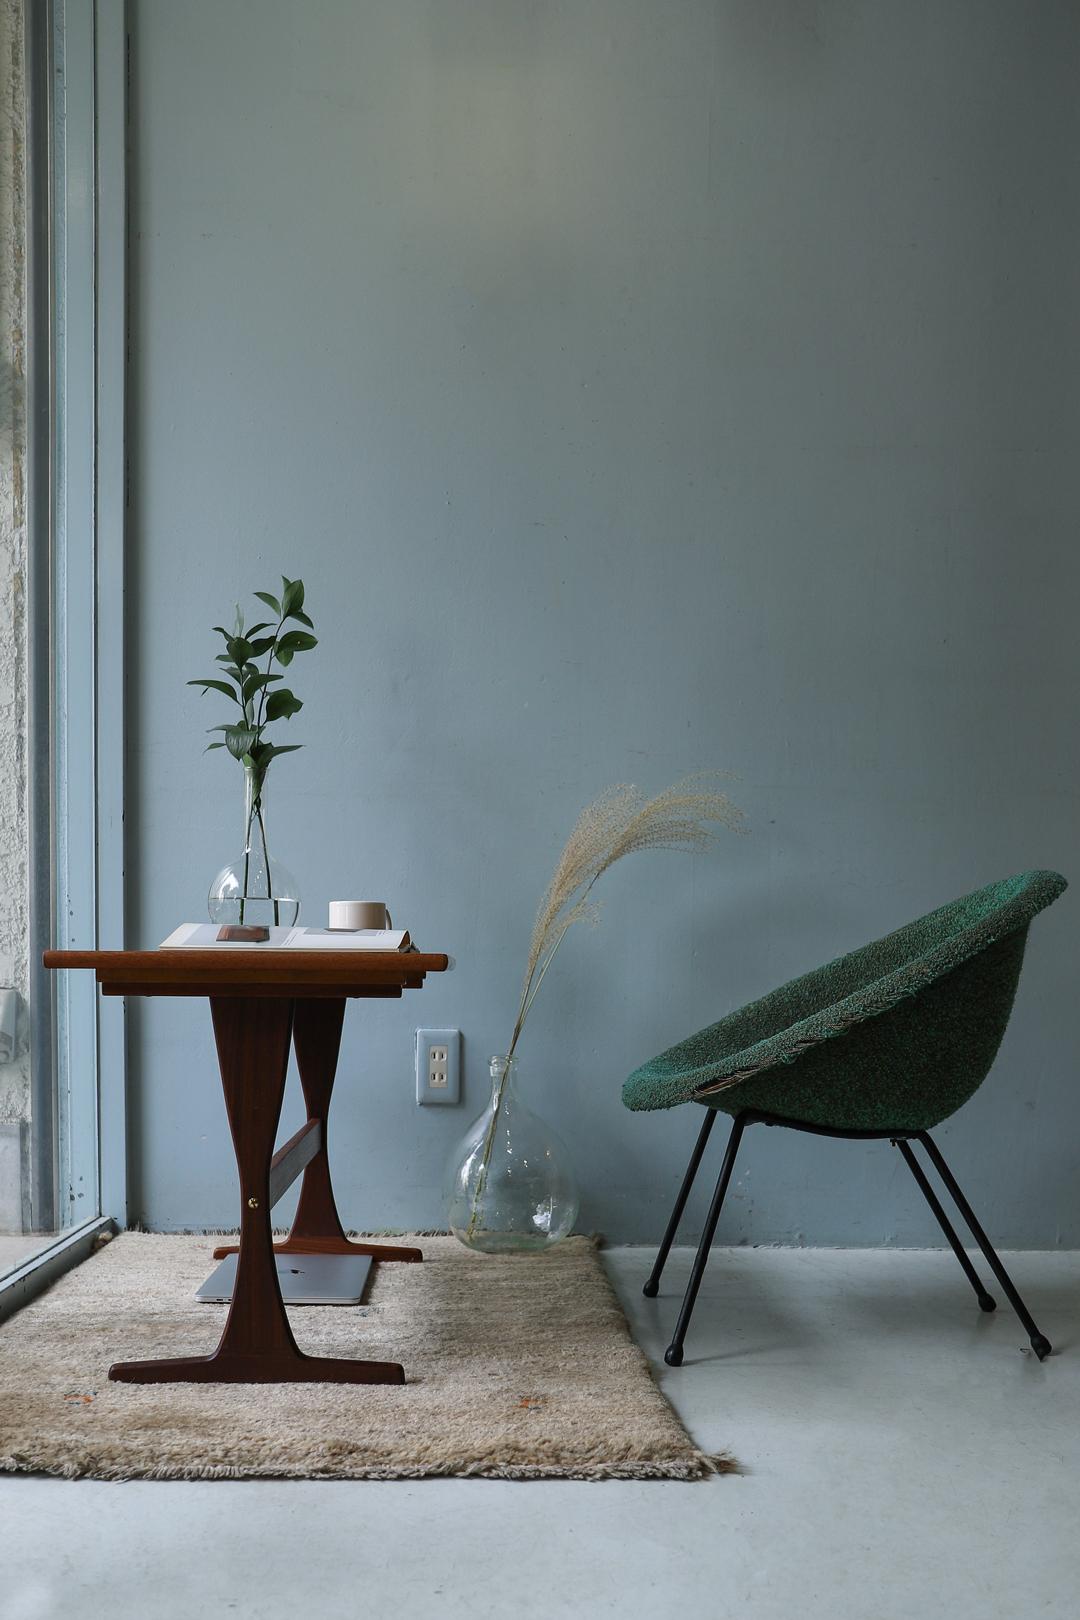 Scandinavian Vintage Trestle Side Table/北欧ヴィンテージ サイドテーブル ローテーブル チーク材 ミッドセンチュリーモダン